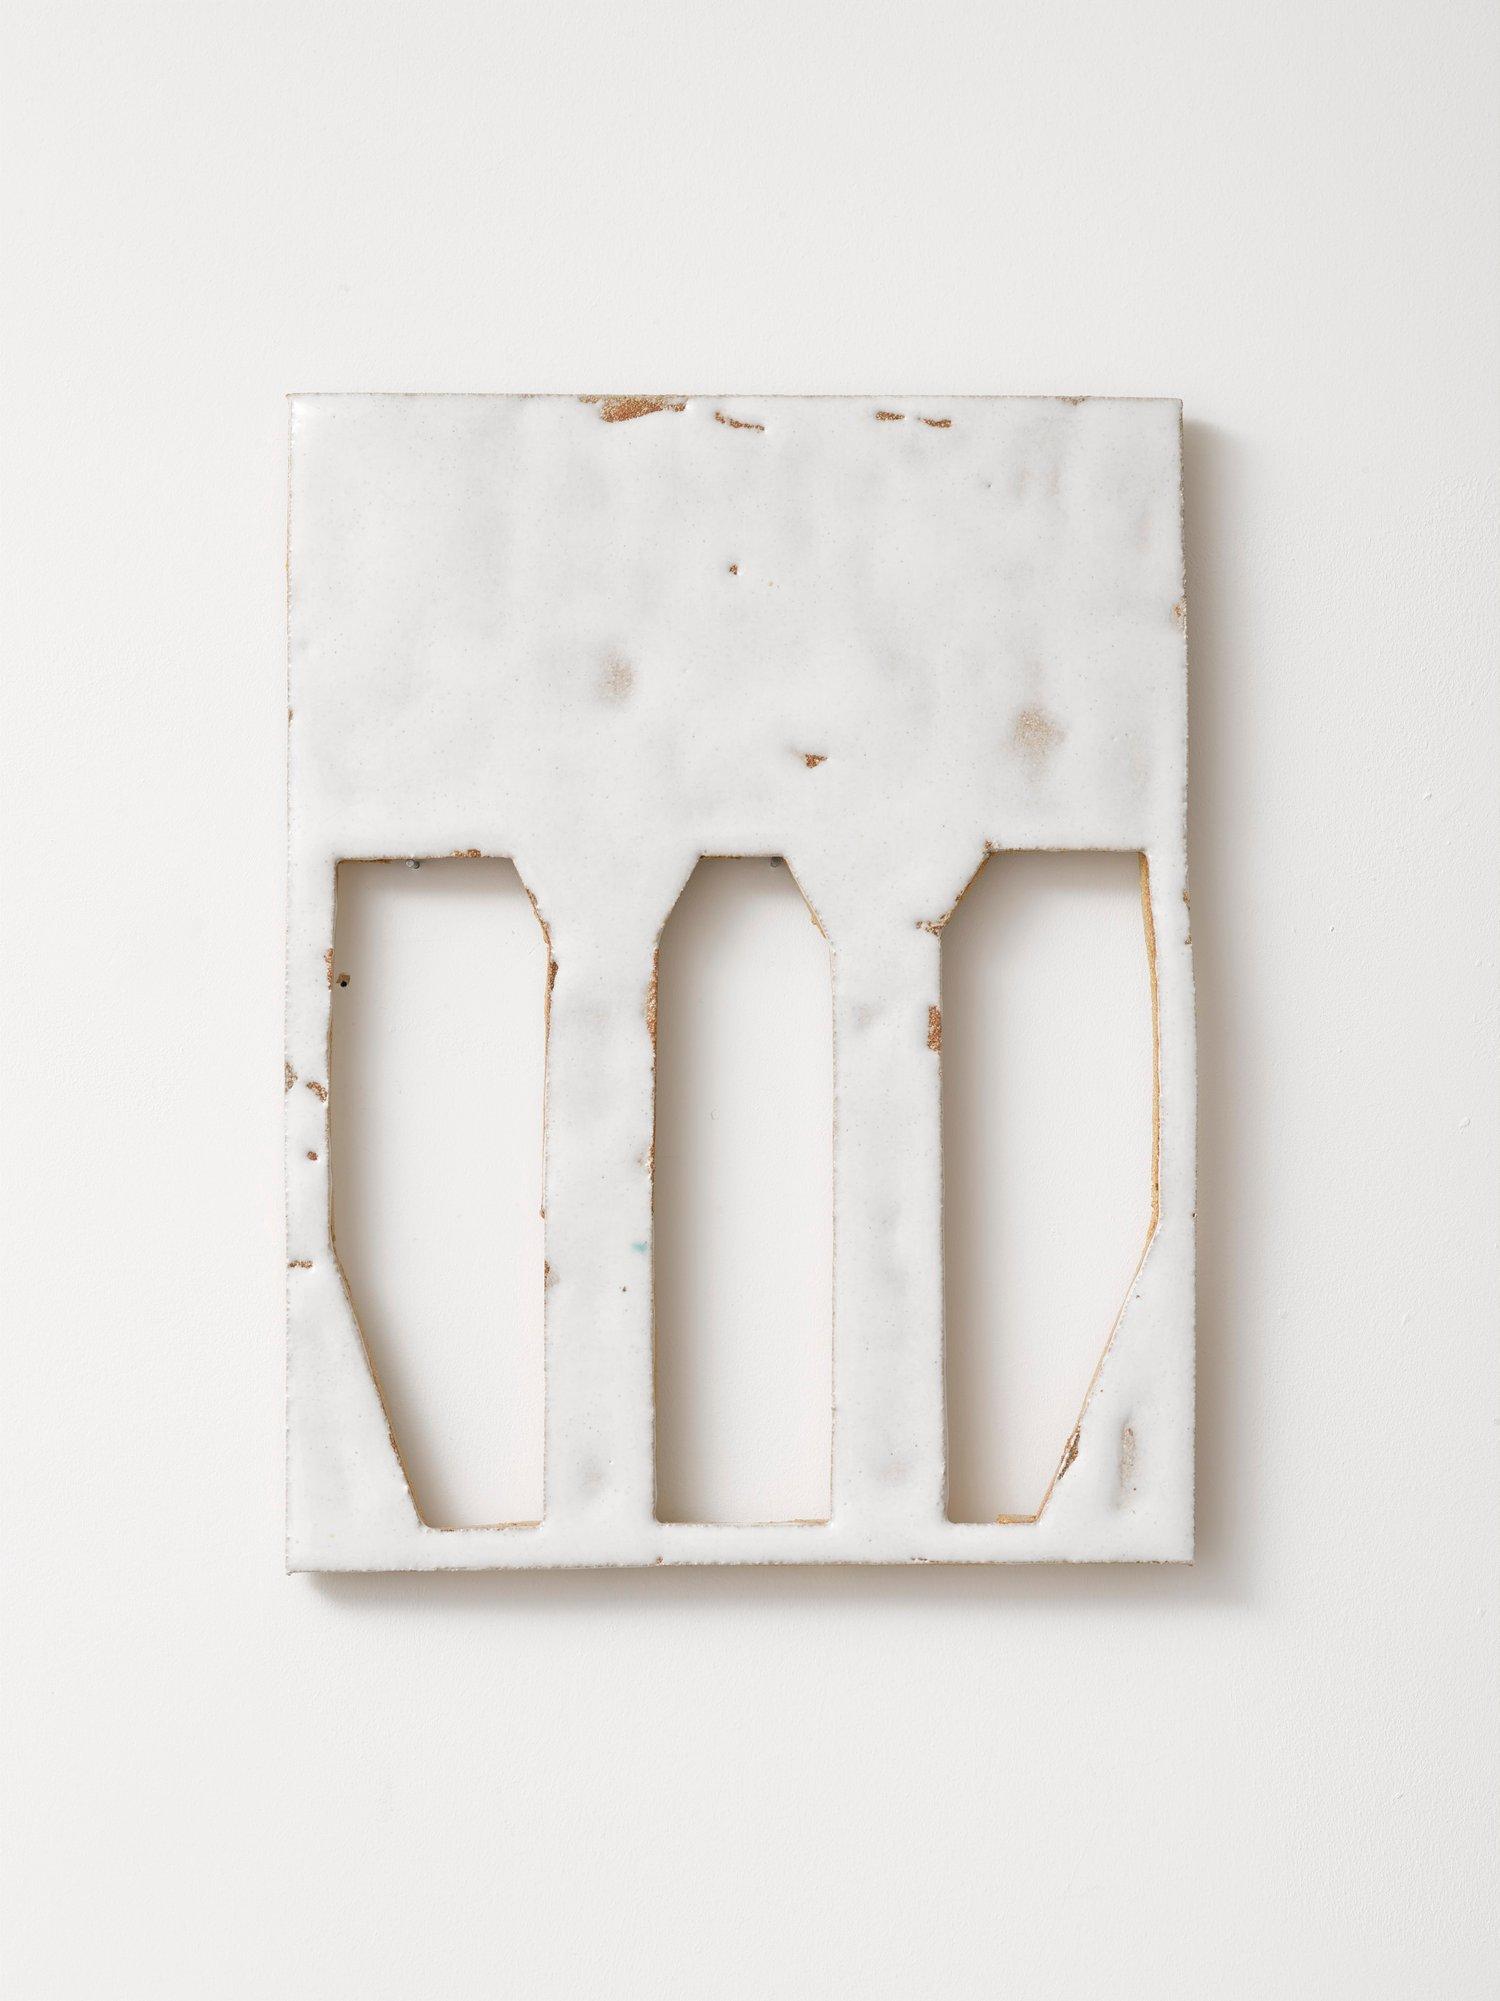 VEST, Michael Thomas Murphy (2016)